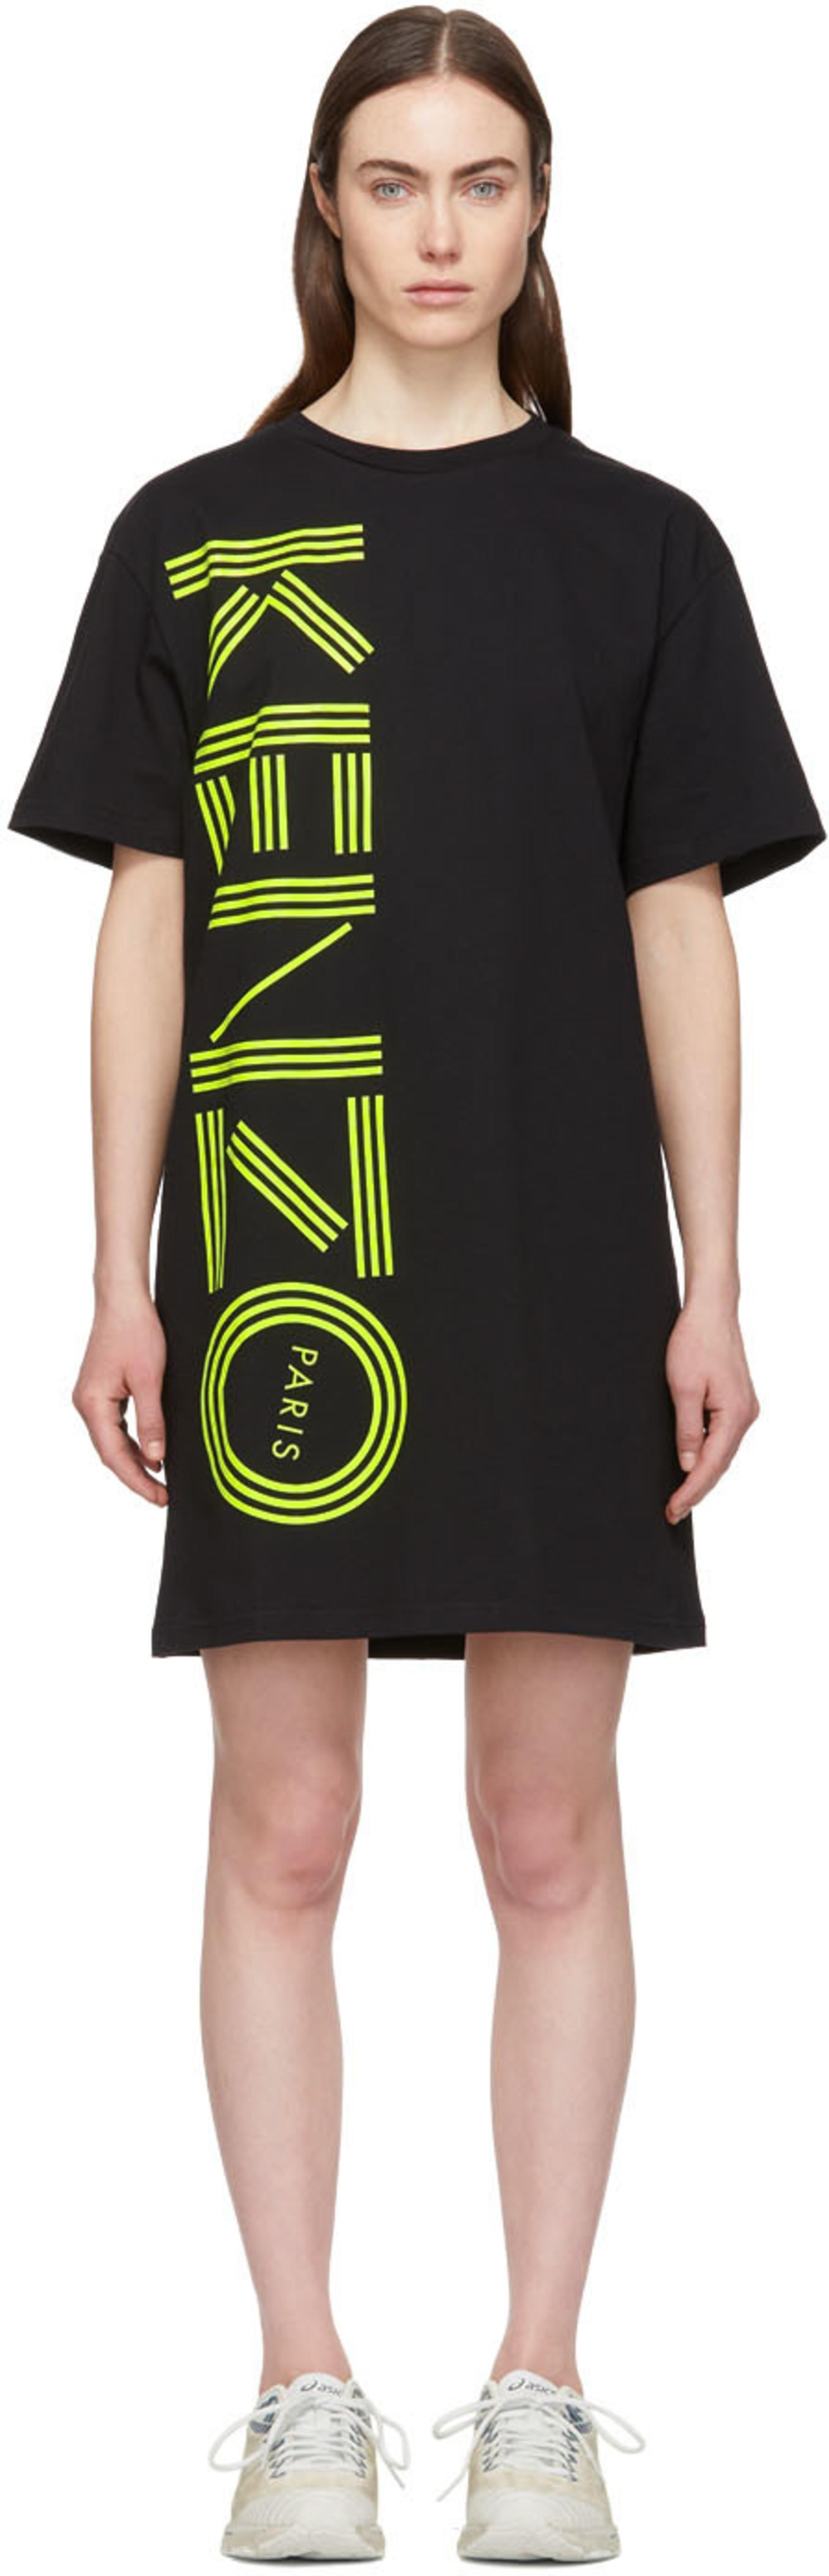 4910637da Kenzo for Women SS19 Collection | SSENSE